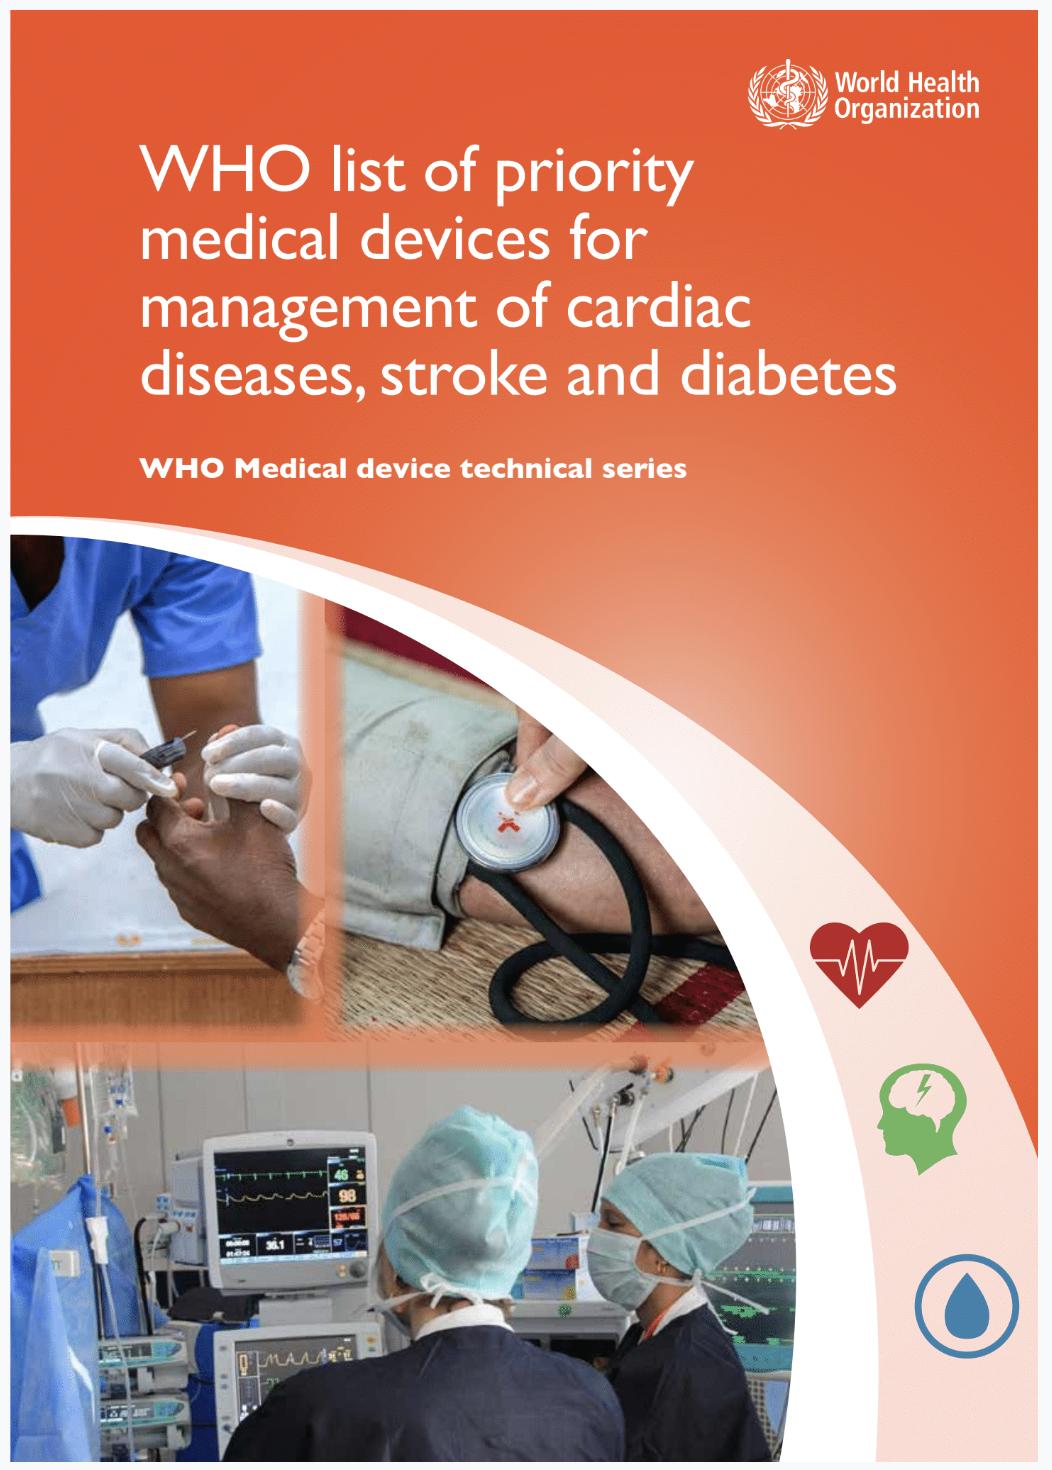 Cardiovascular diseases and diabetes